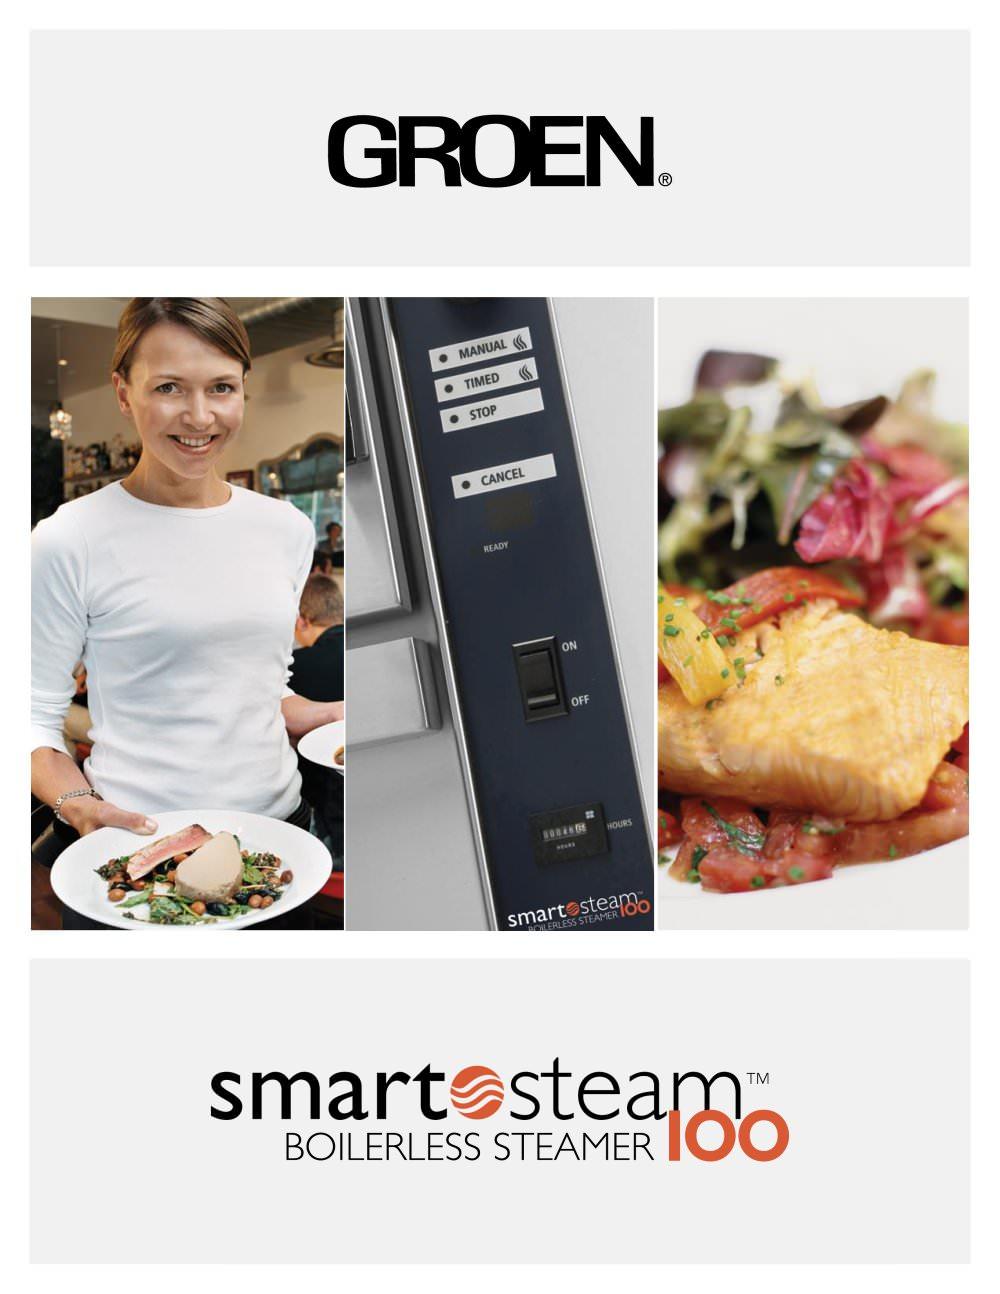 Smartsteam100 boilerless steamer groen pdf catalogues smartsteam100 boilerless steamer 1 8 pages forumfinder Image collections